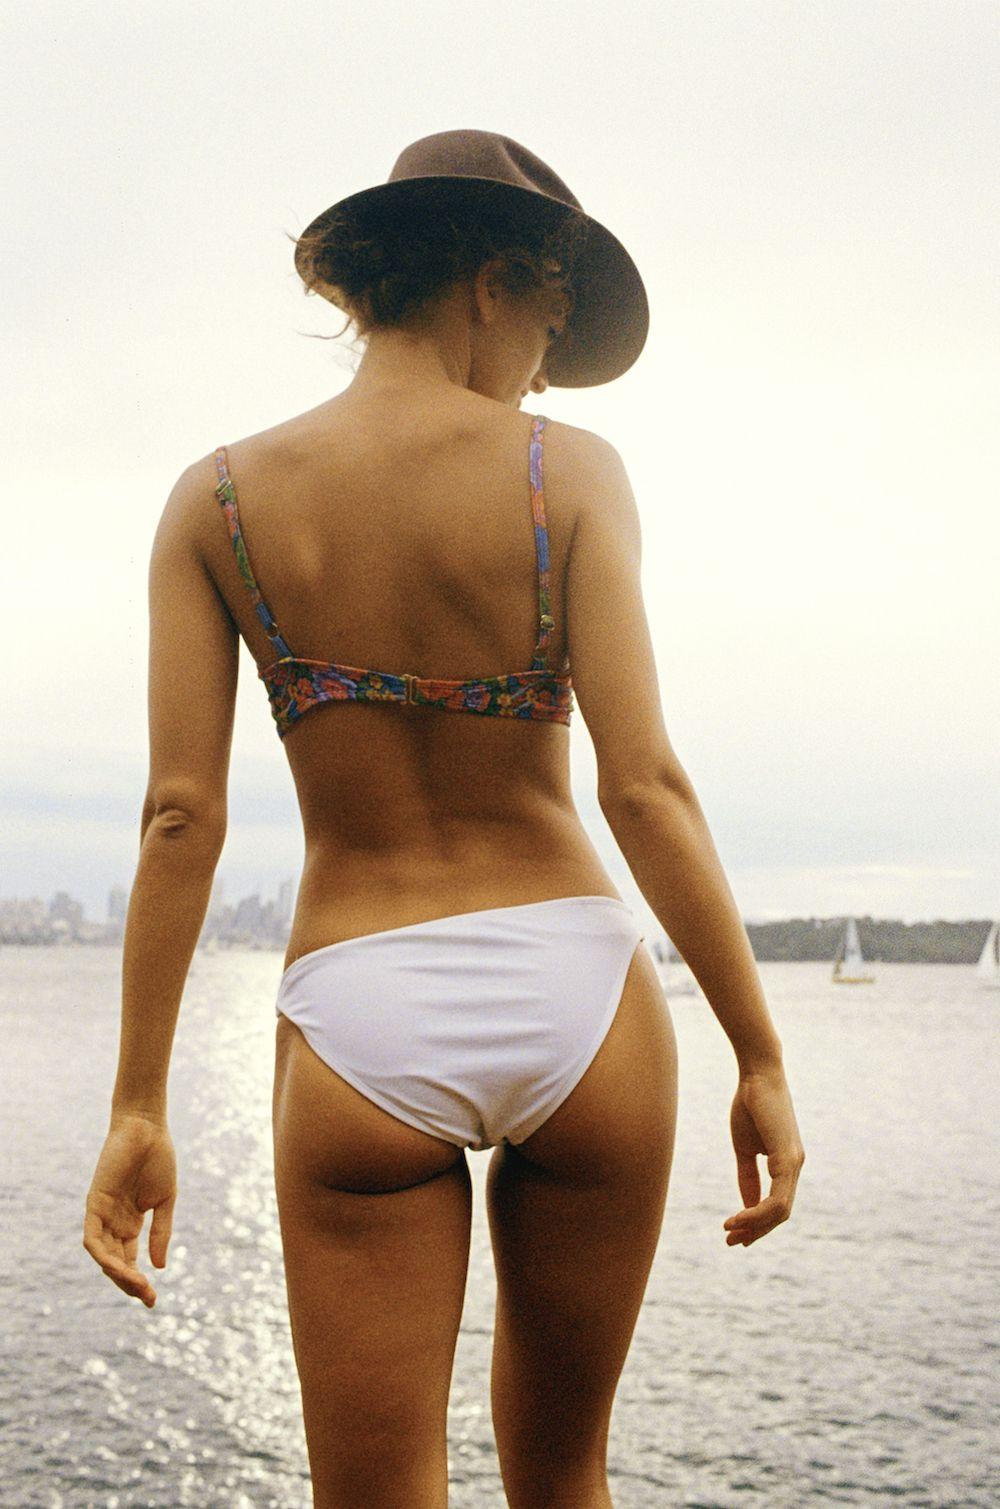 LOVEMORE photo by ANNABEL WENDT on 35mm film for KARAMELEON swimwear. model - KATIE KUIPER